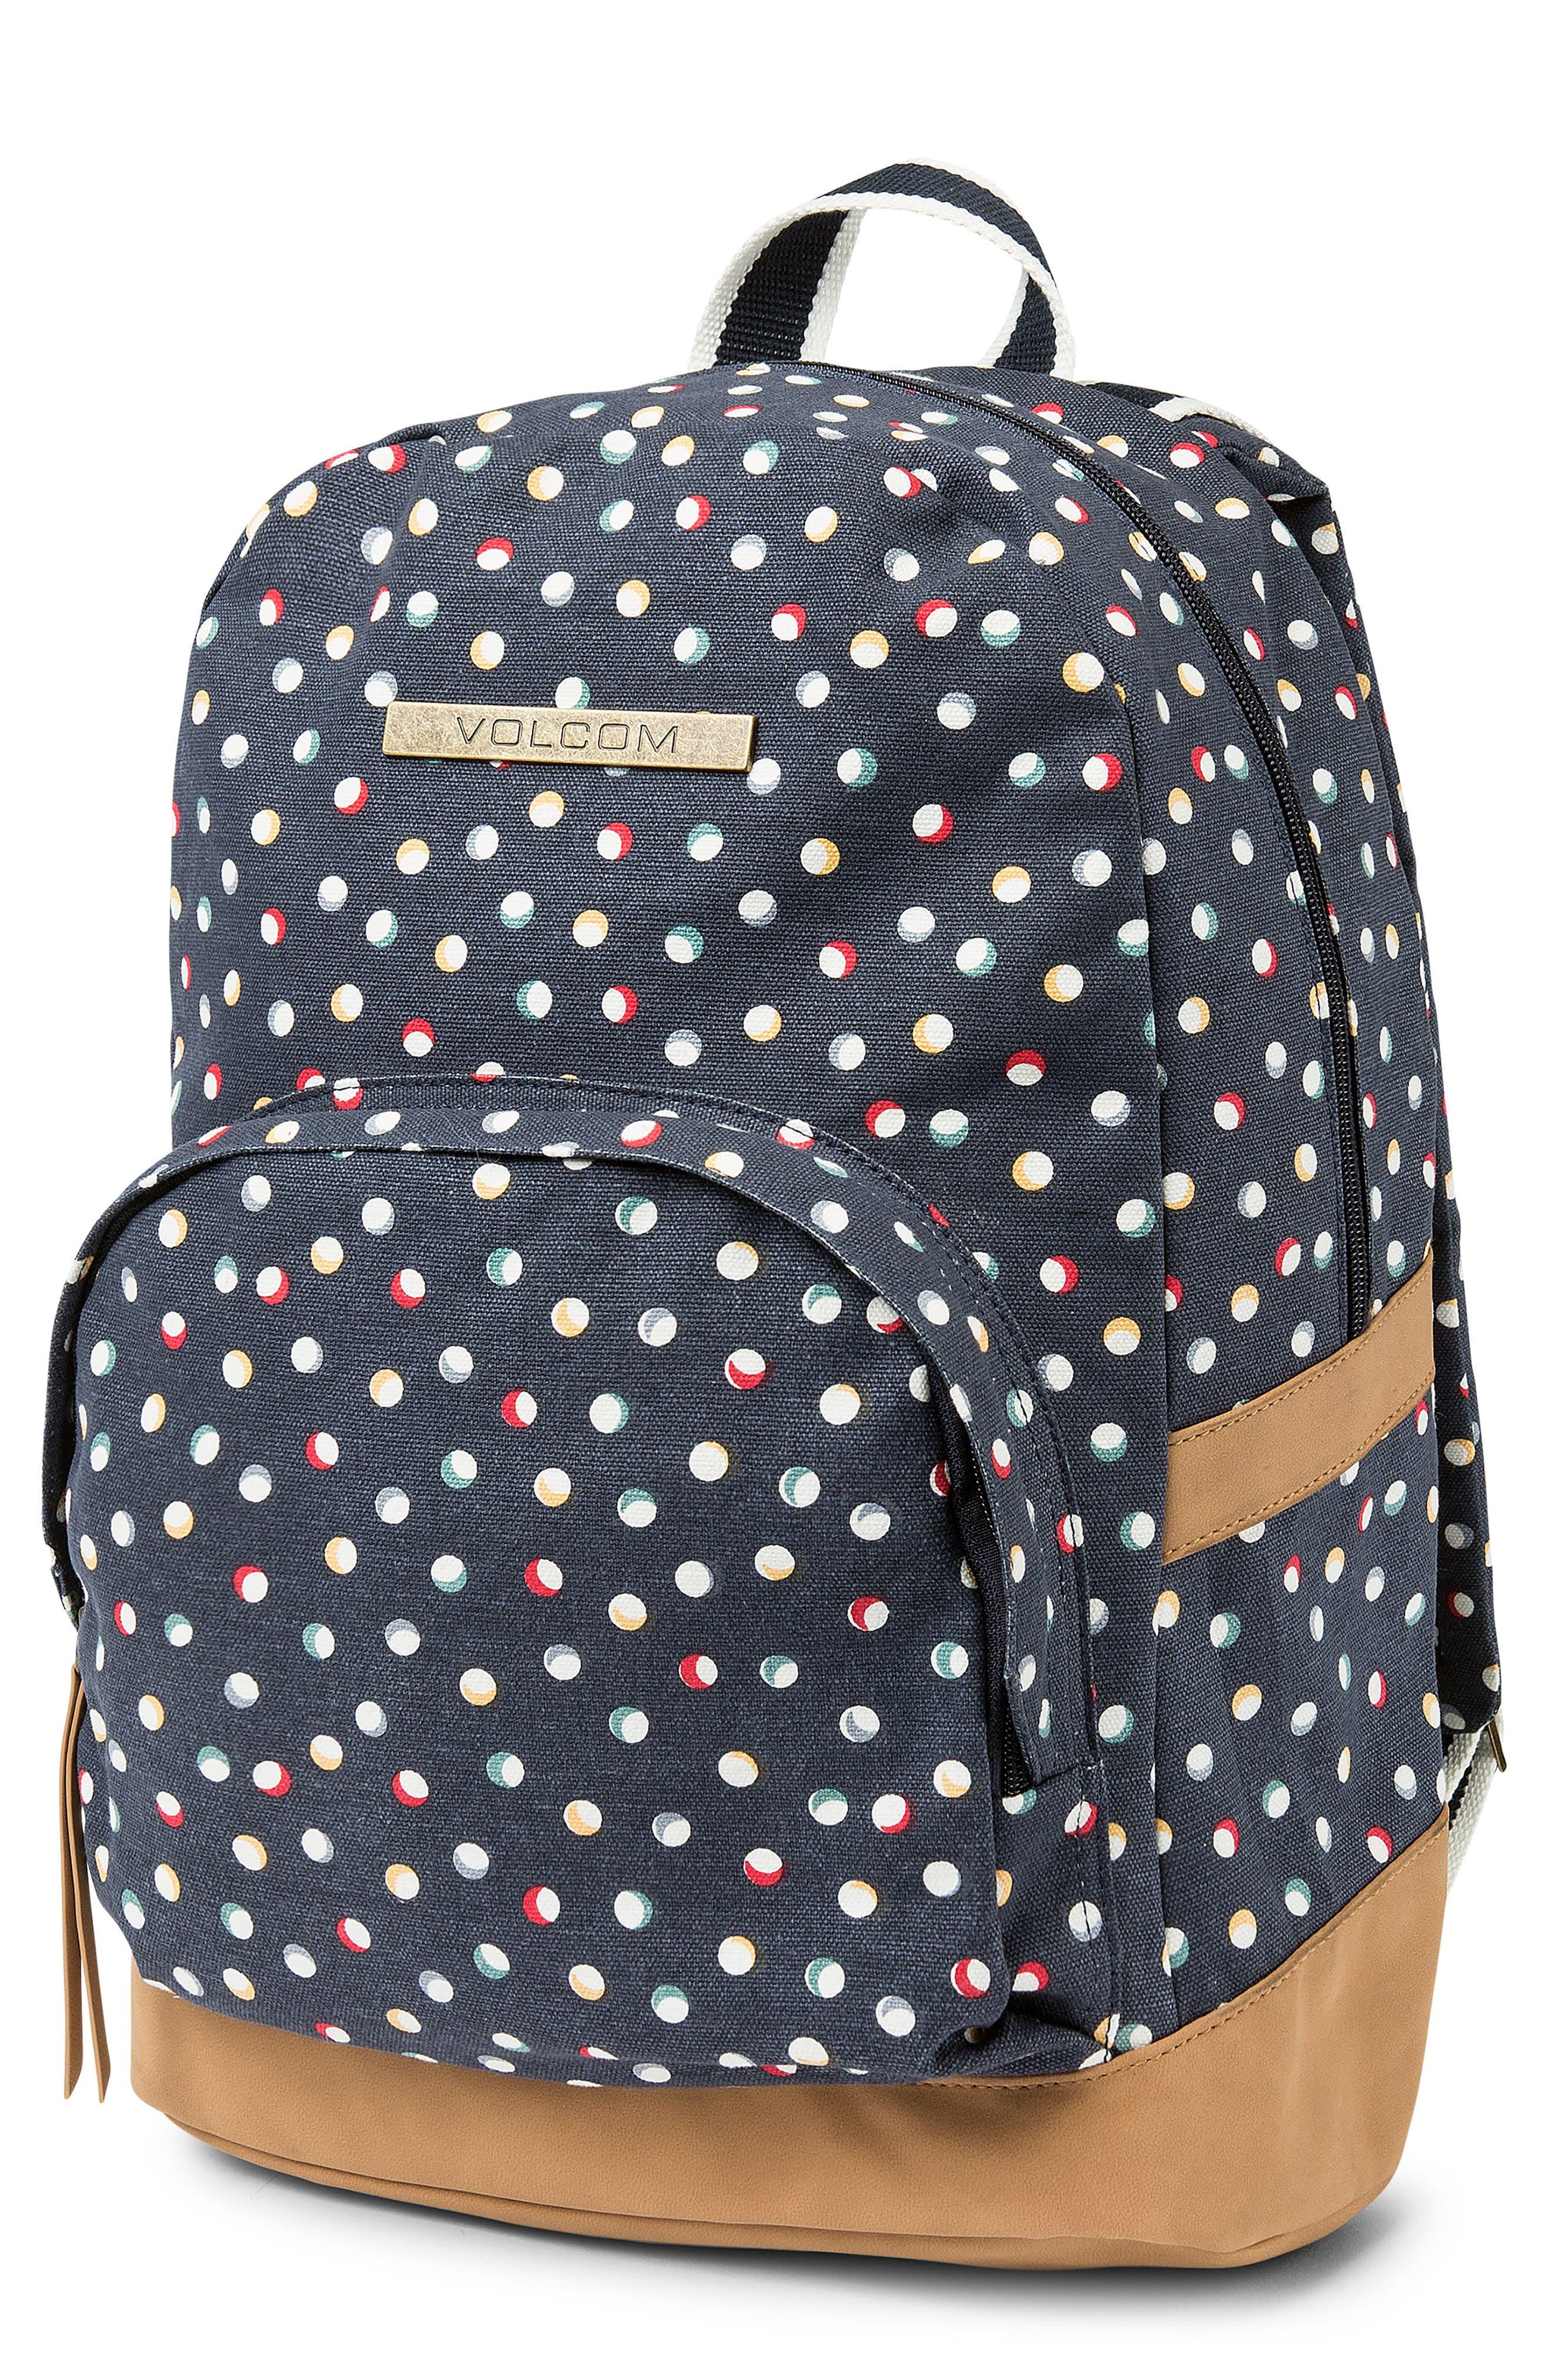 Vacations Canvas Backpack,                         Main,                         color, SEA NAVY